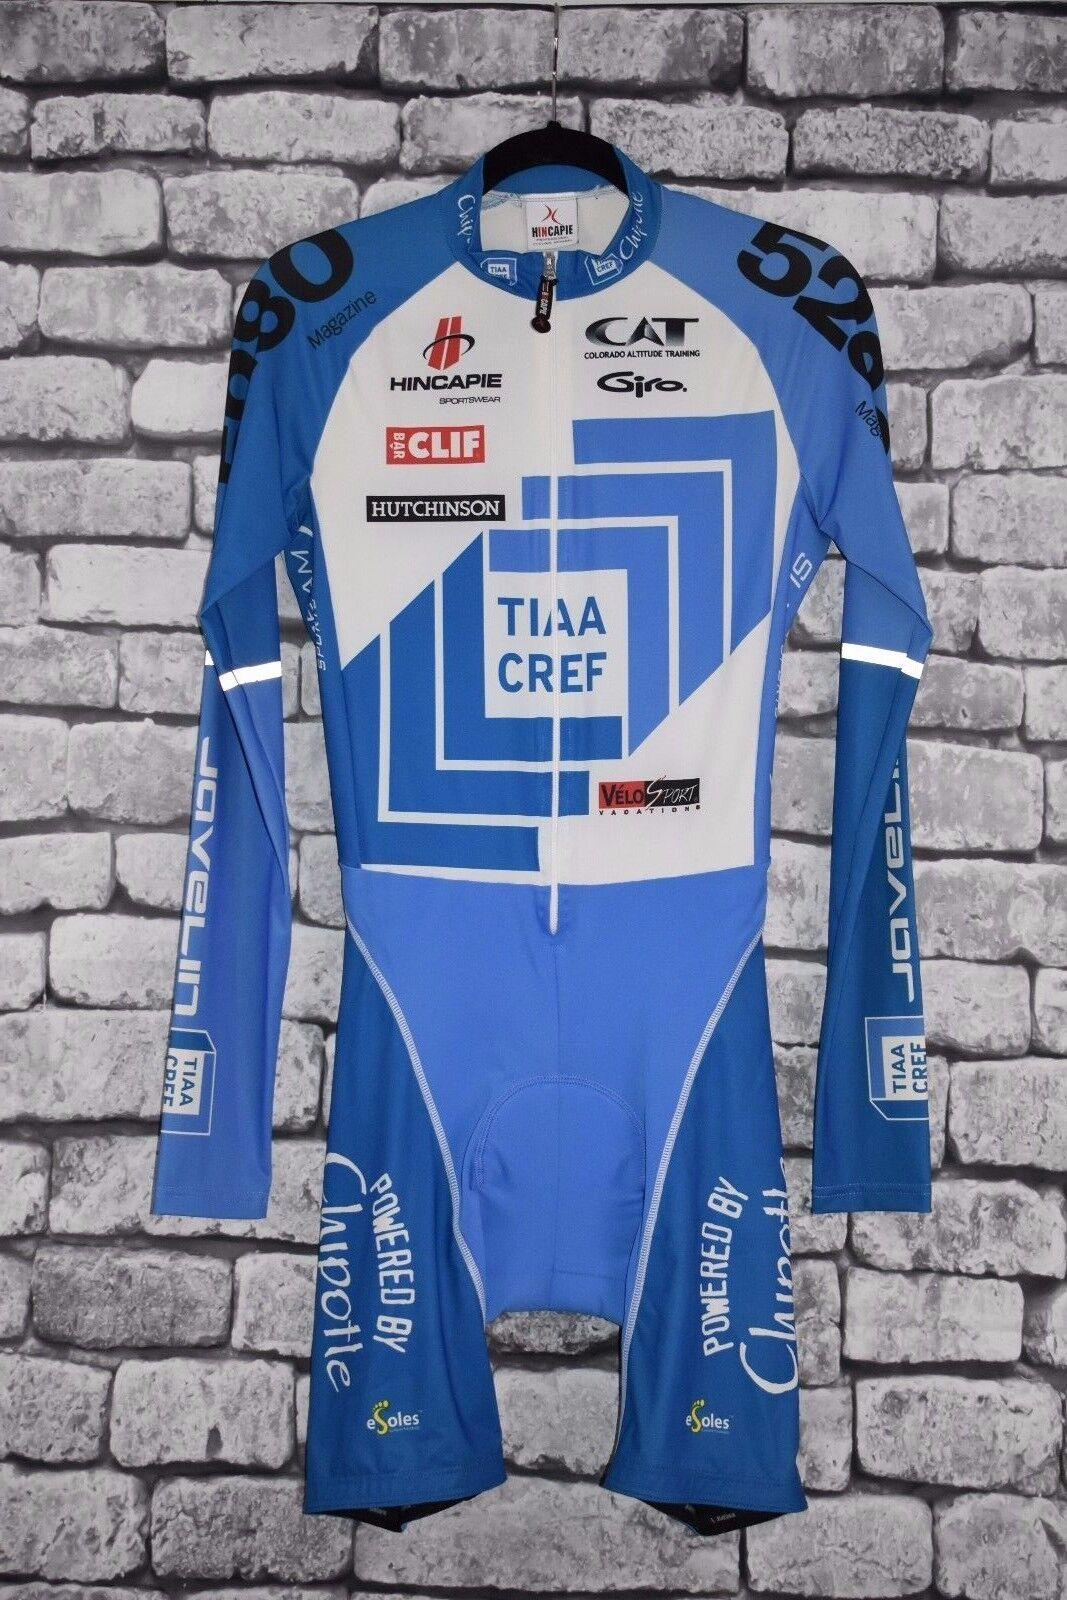 Hincapie TIAA CREF  Team Cycling Skinsuit Long Sleeve Size Medium  good reputation